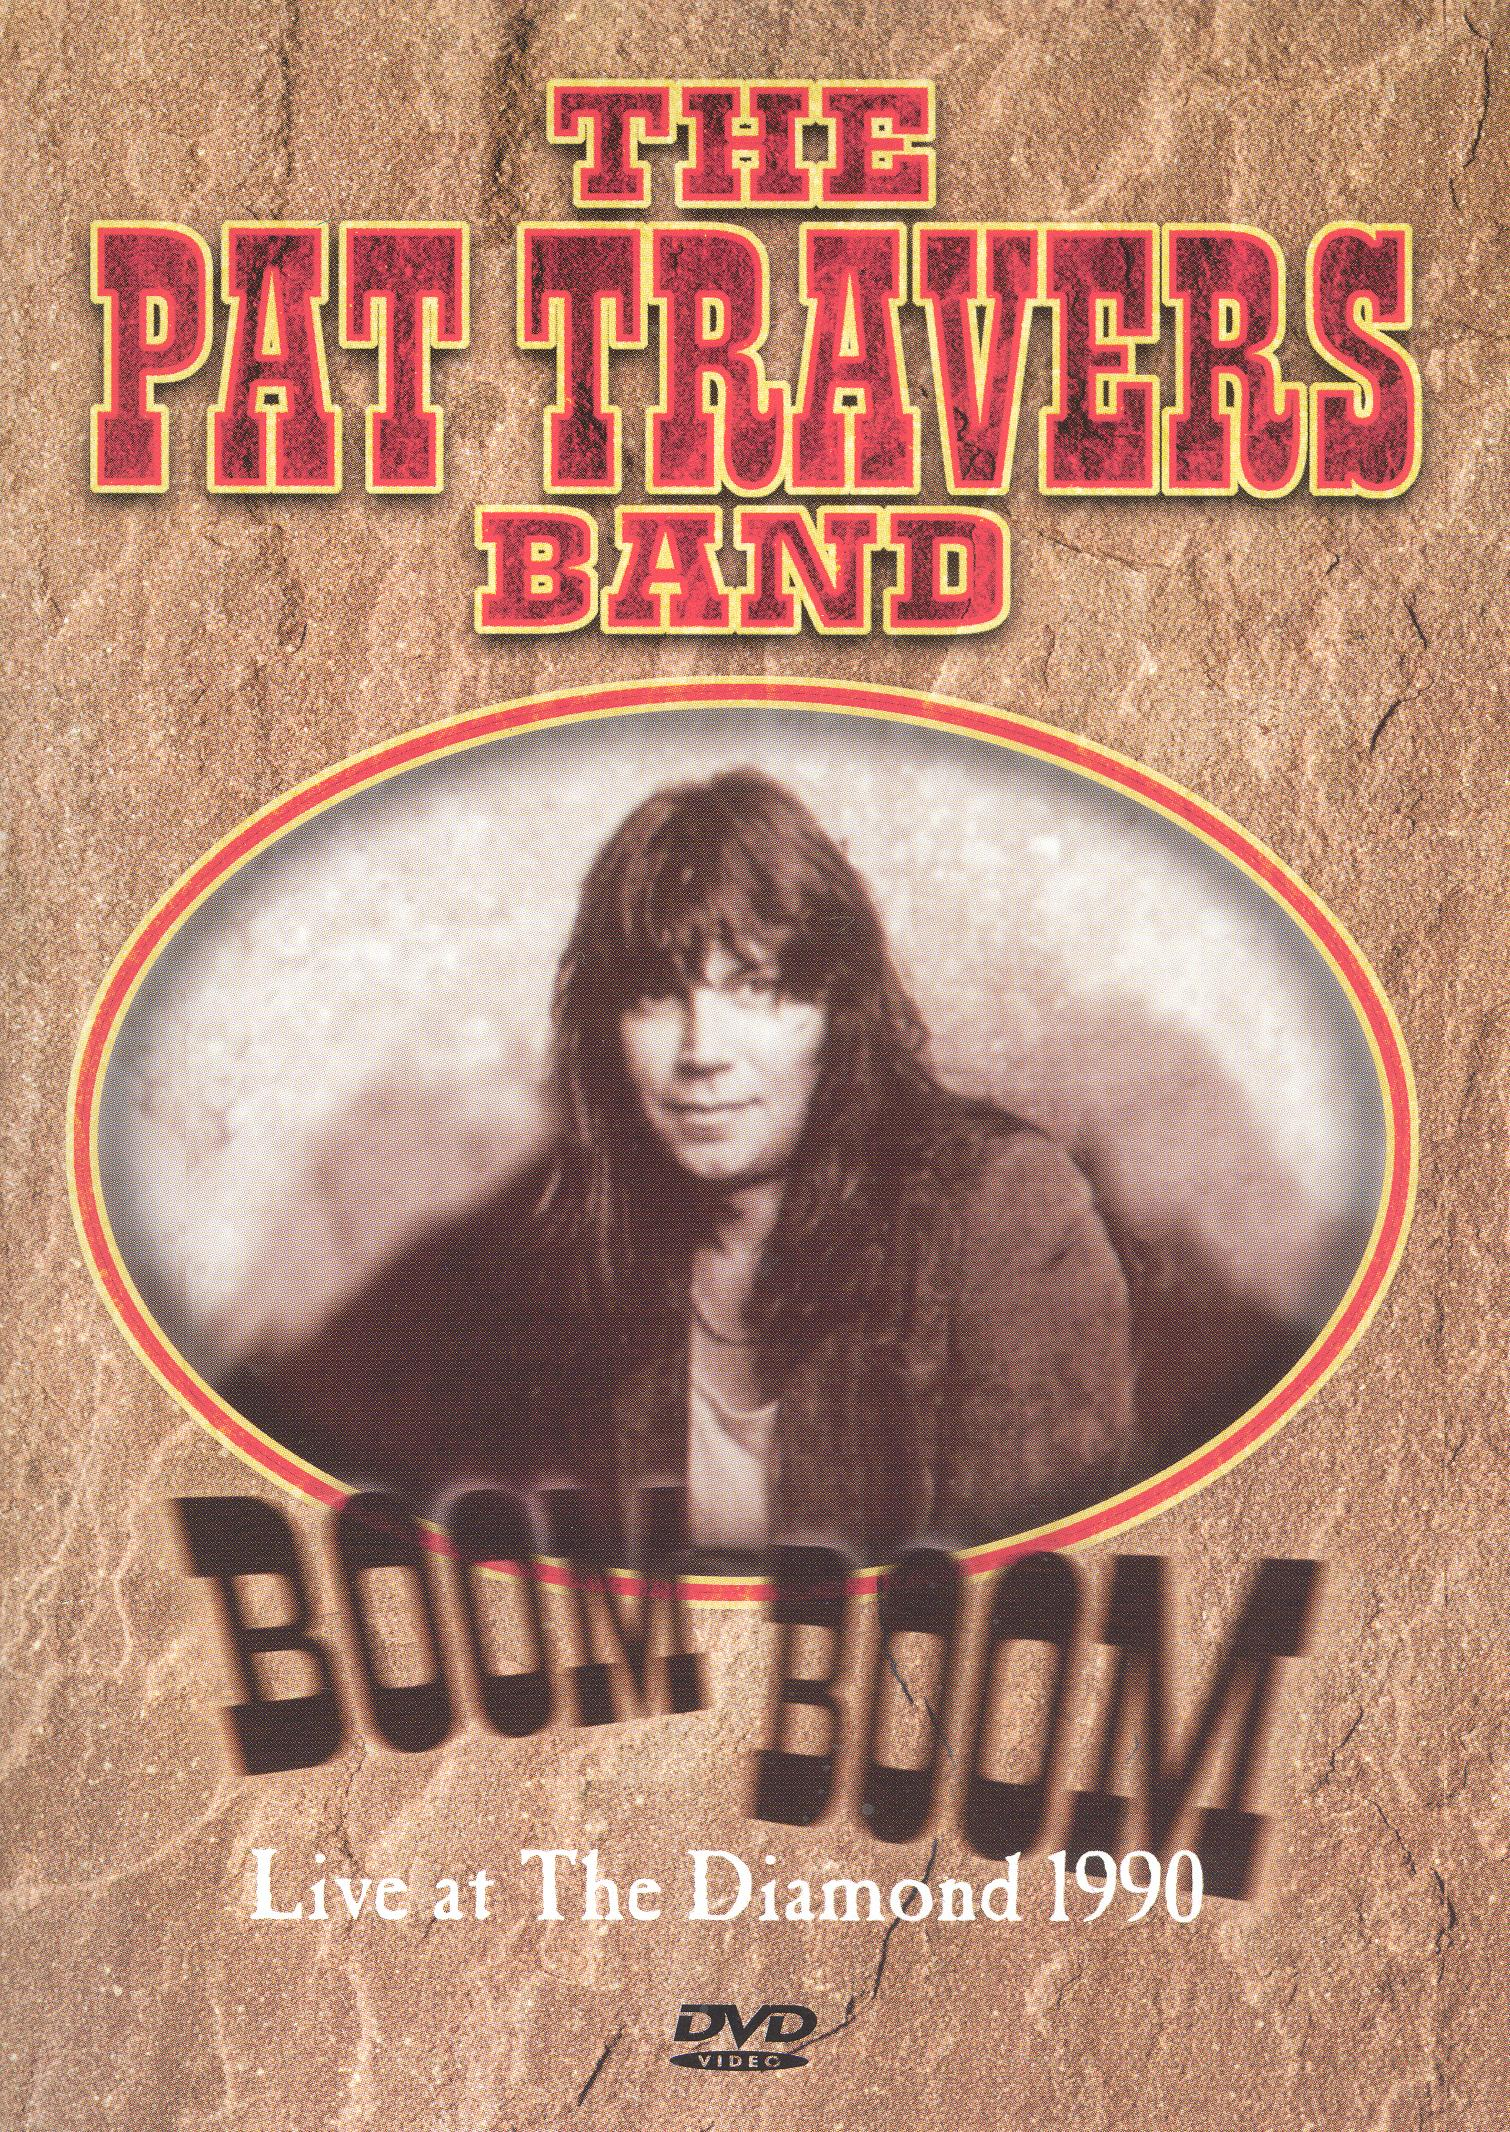 Pat Travers: Boom Boom - Live at the Diamond Toronto 1990